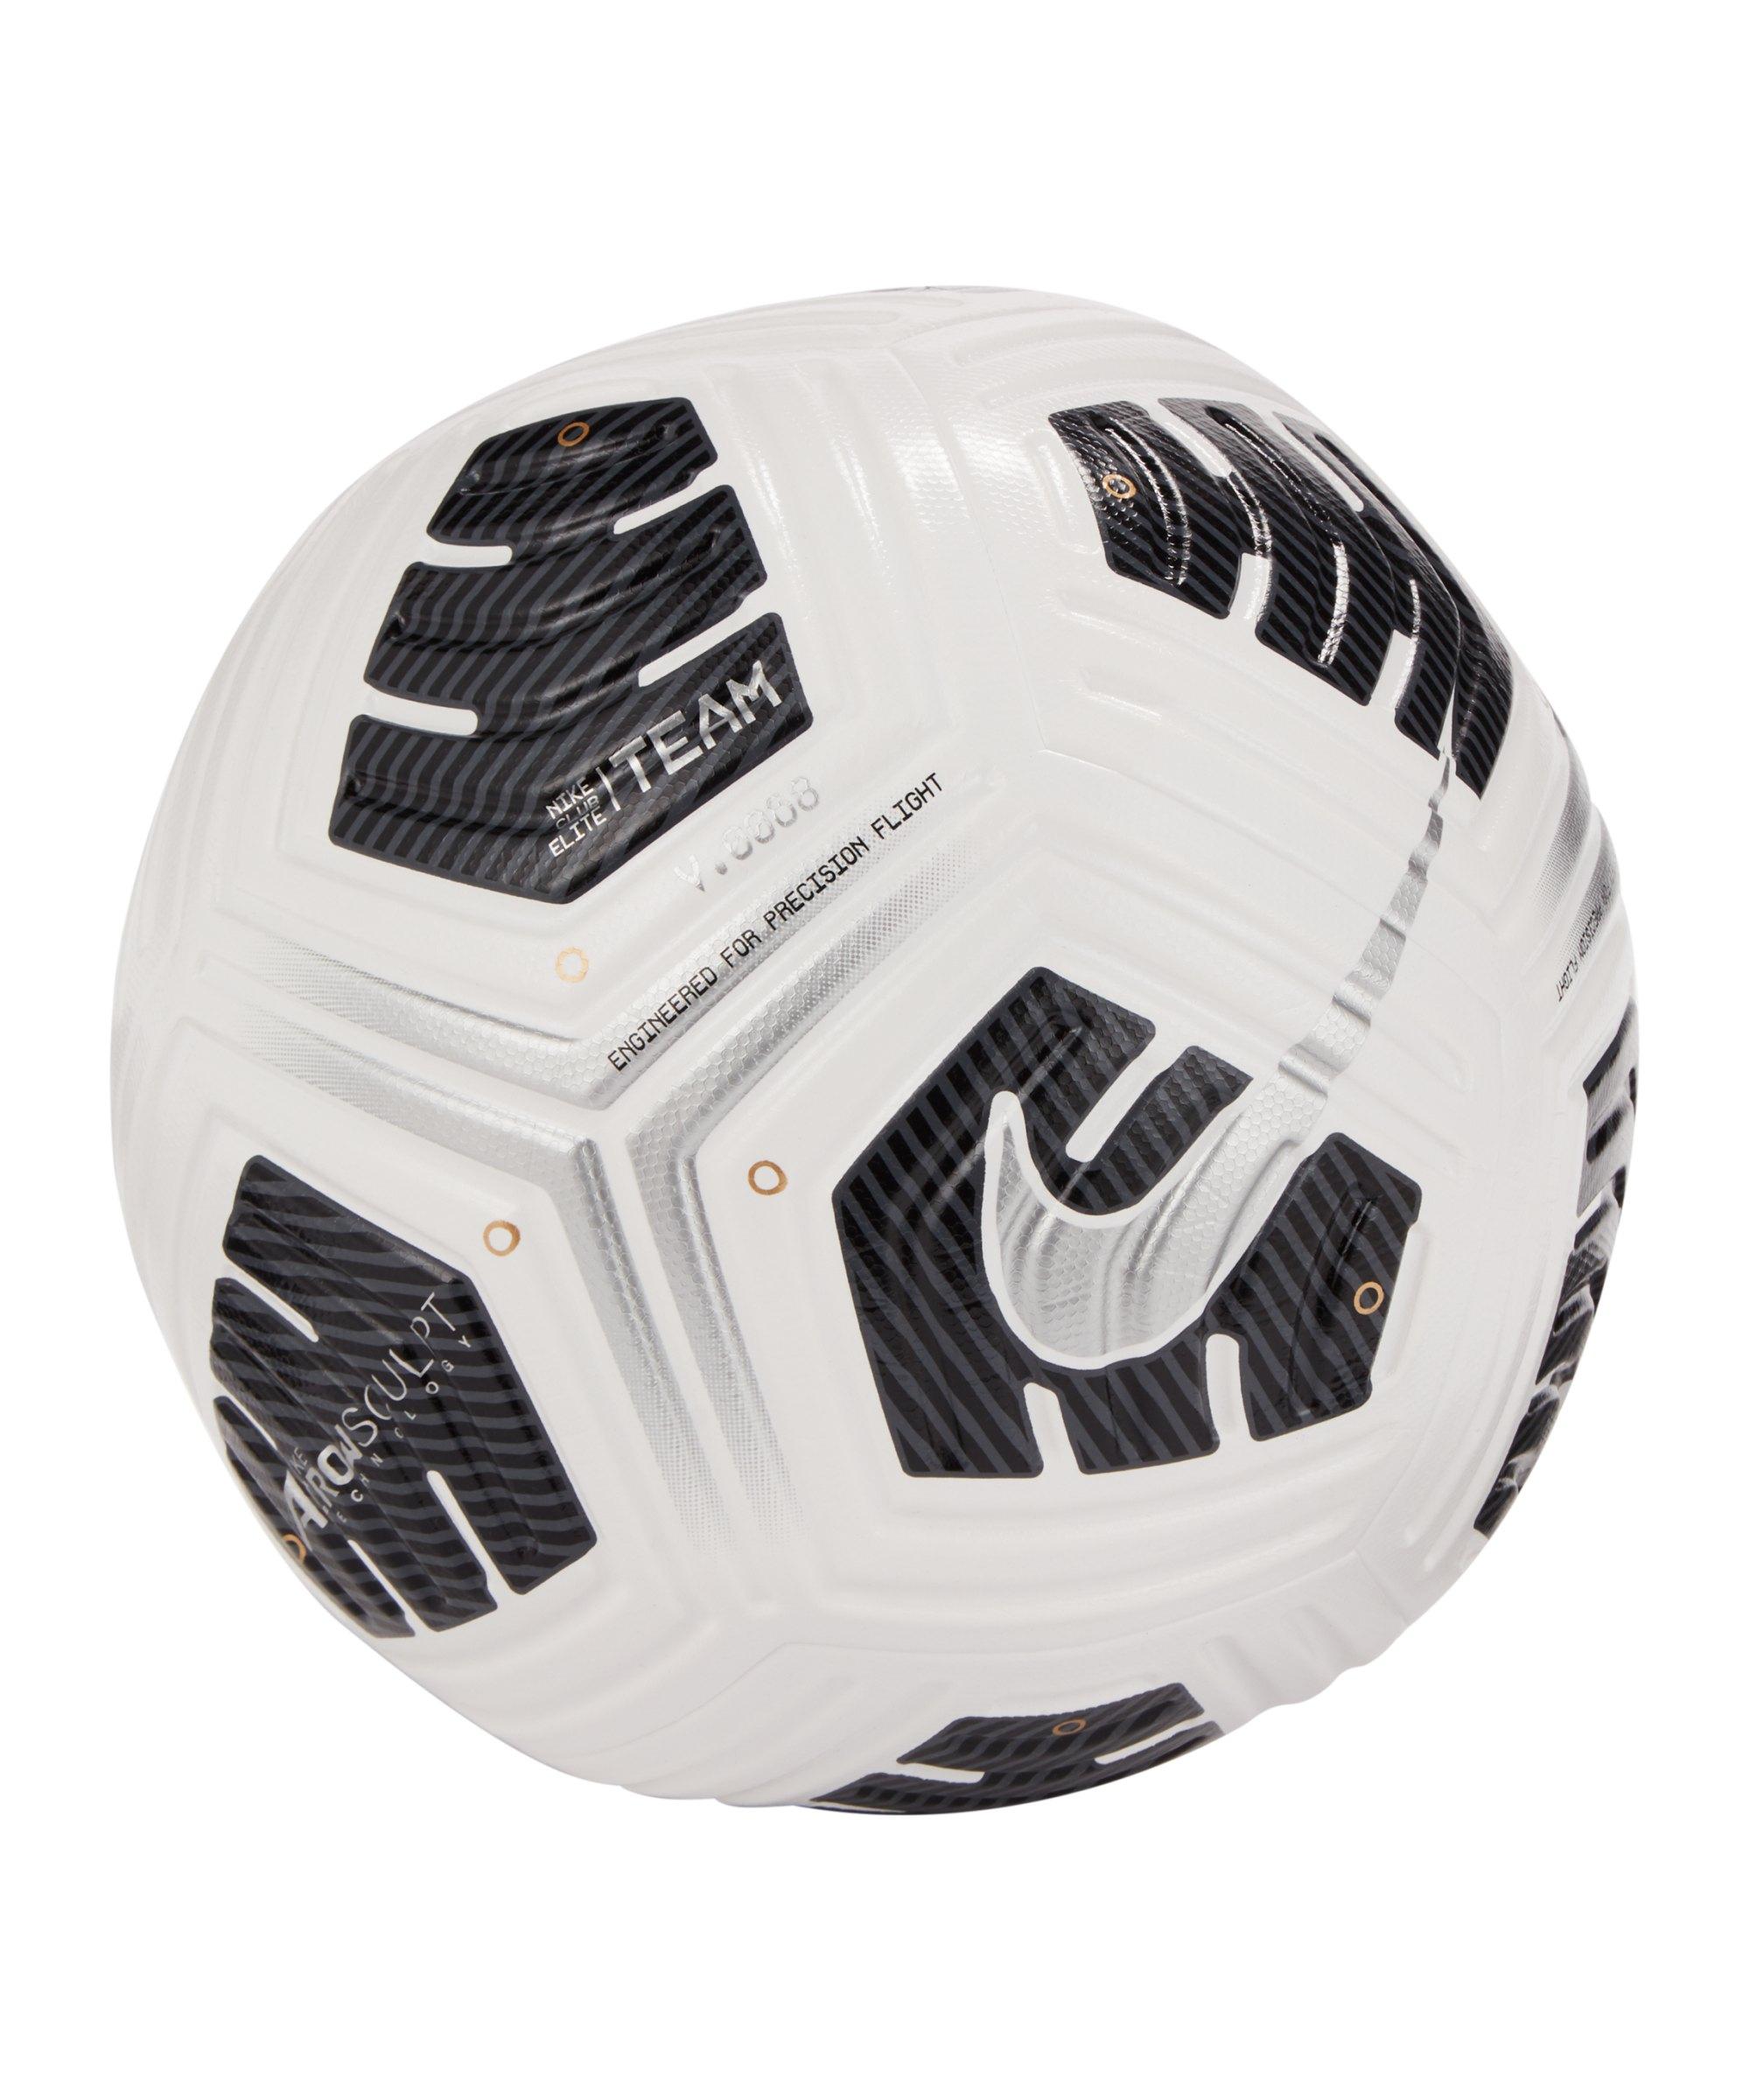 Nike Club Elite Team Trainingsball Weiss F100 - weiss